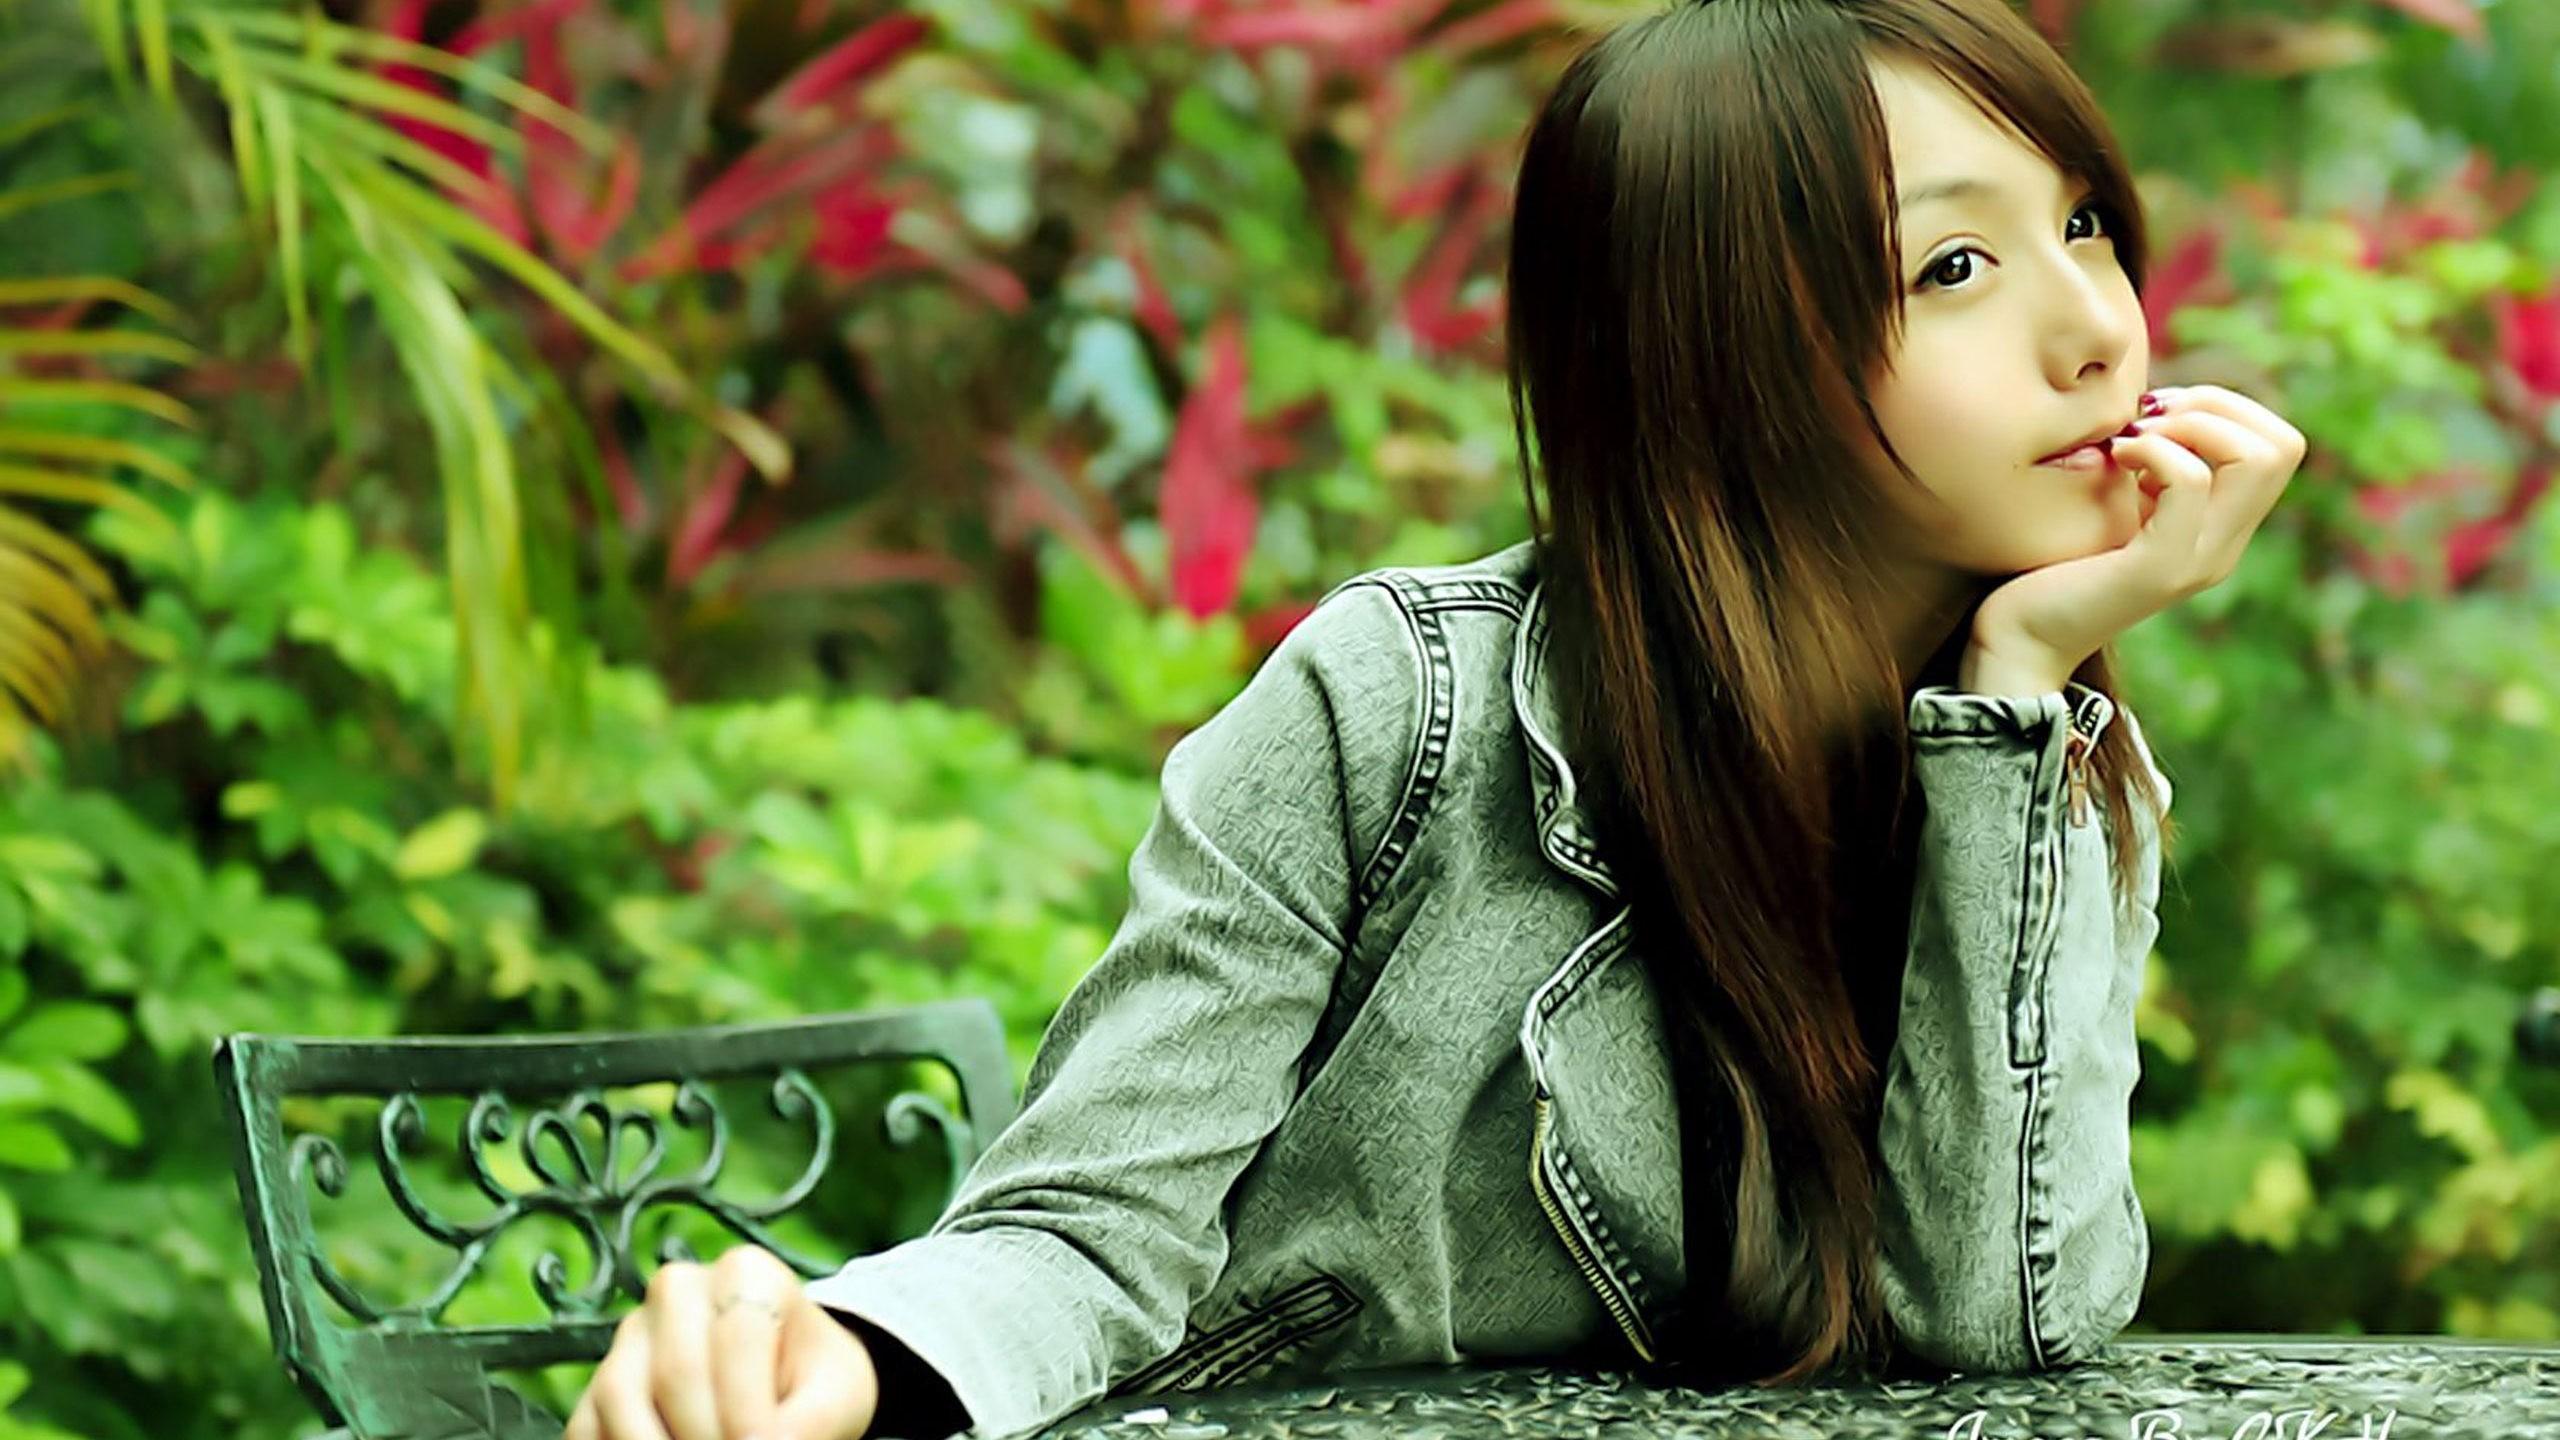 Fuck regard half asian girls as beautiful from viper girls